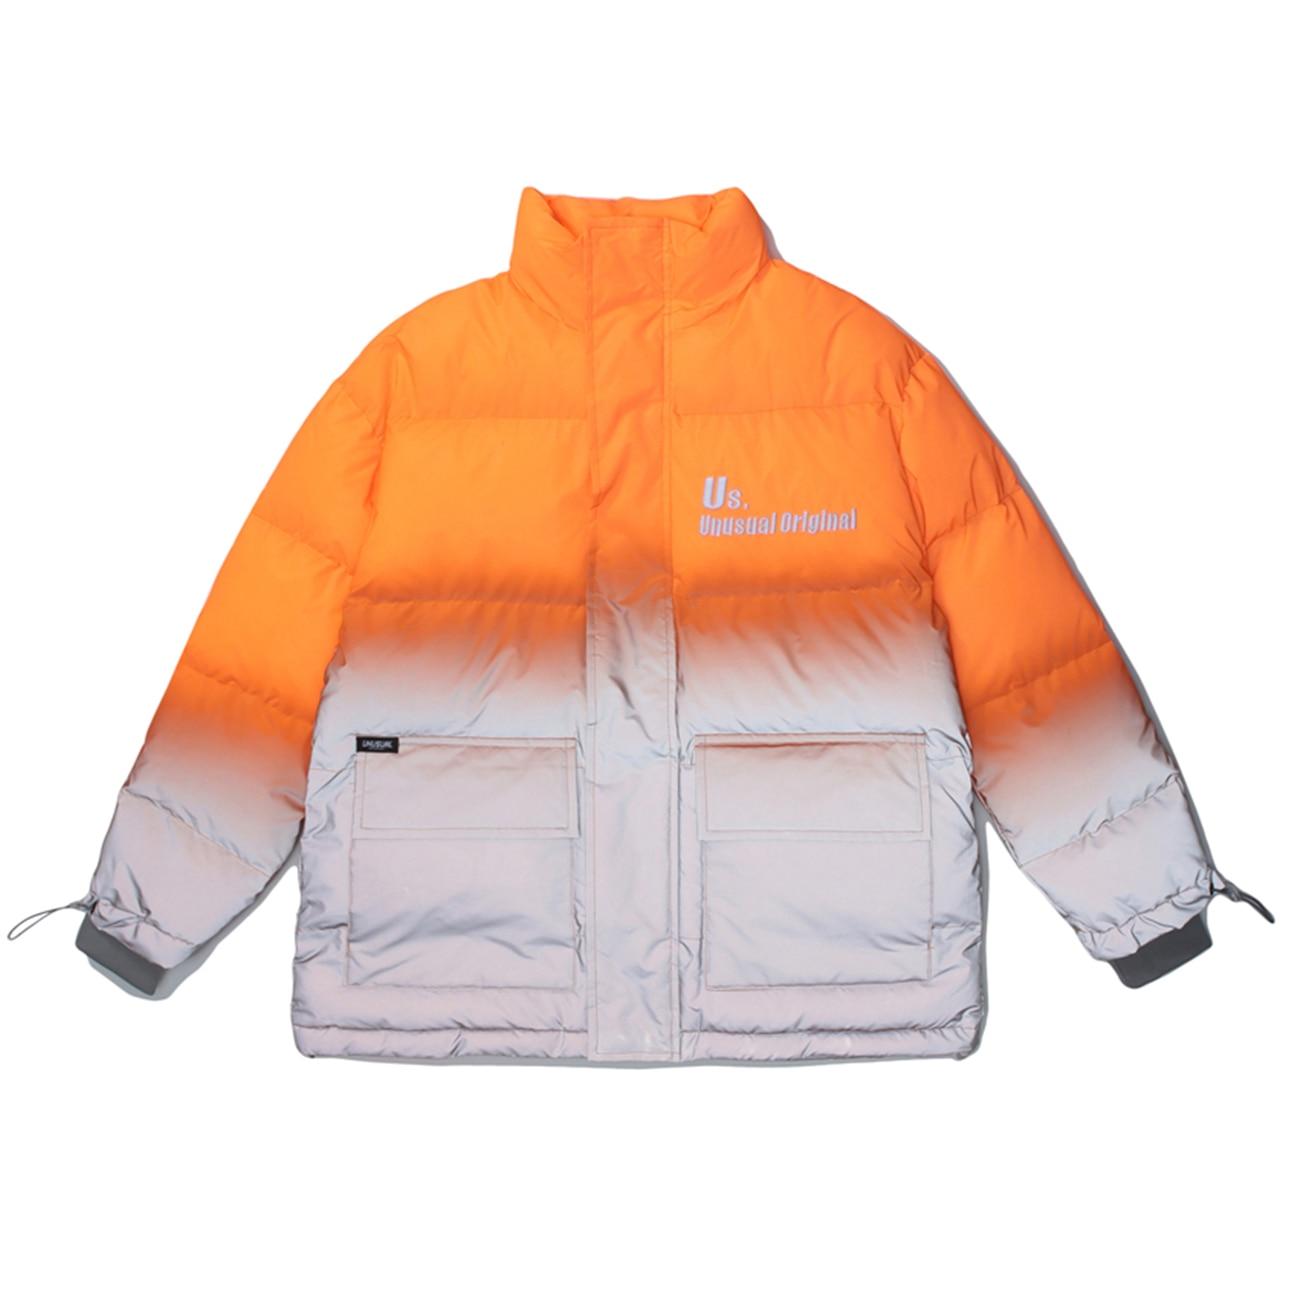 LACIBLE Thick Parka Jackets Streetwear Harajuku Gradient Reflective Punk Rock Jacket Winter Padded Zipper Jacket Coats Outwear